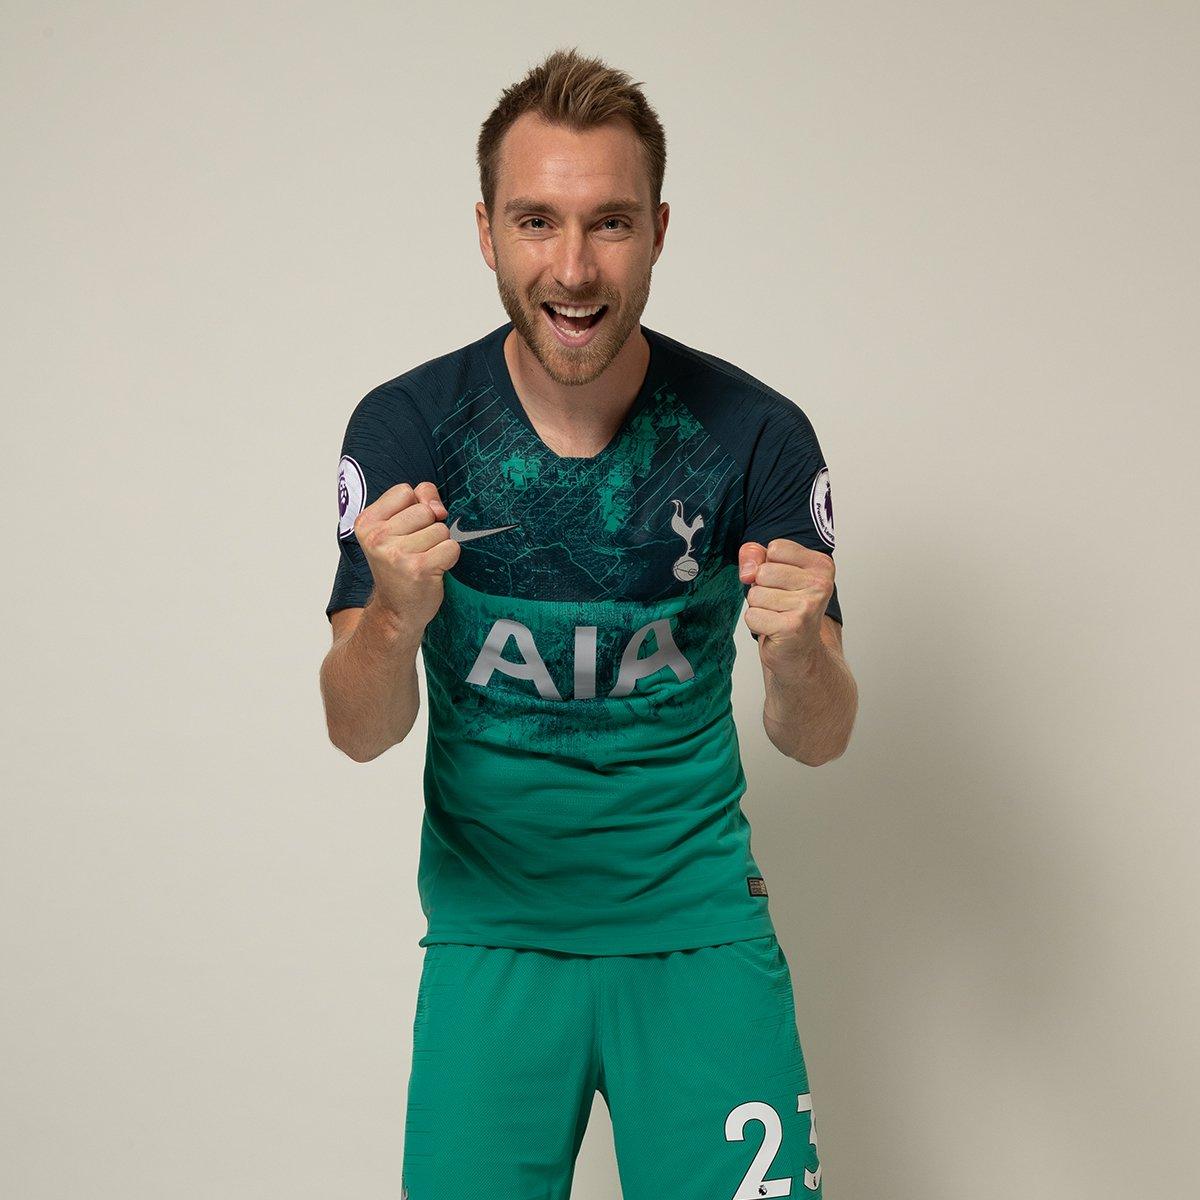 separation shoes ed4f7 f96ba Tottenham Hotspur 2018-19 Nike Third Kit | 18/19 Kits ...